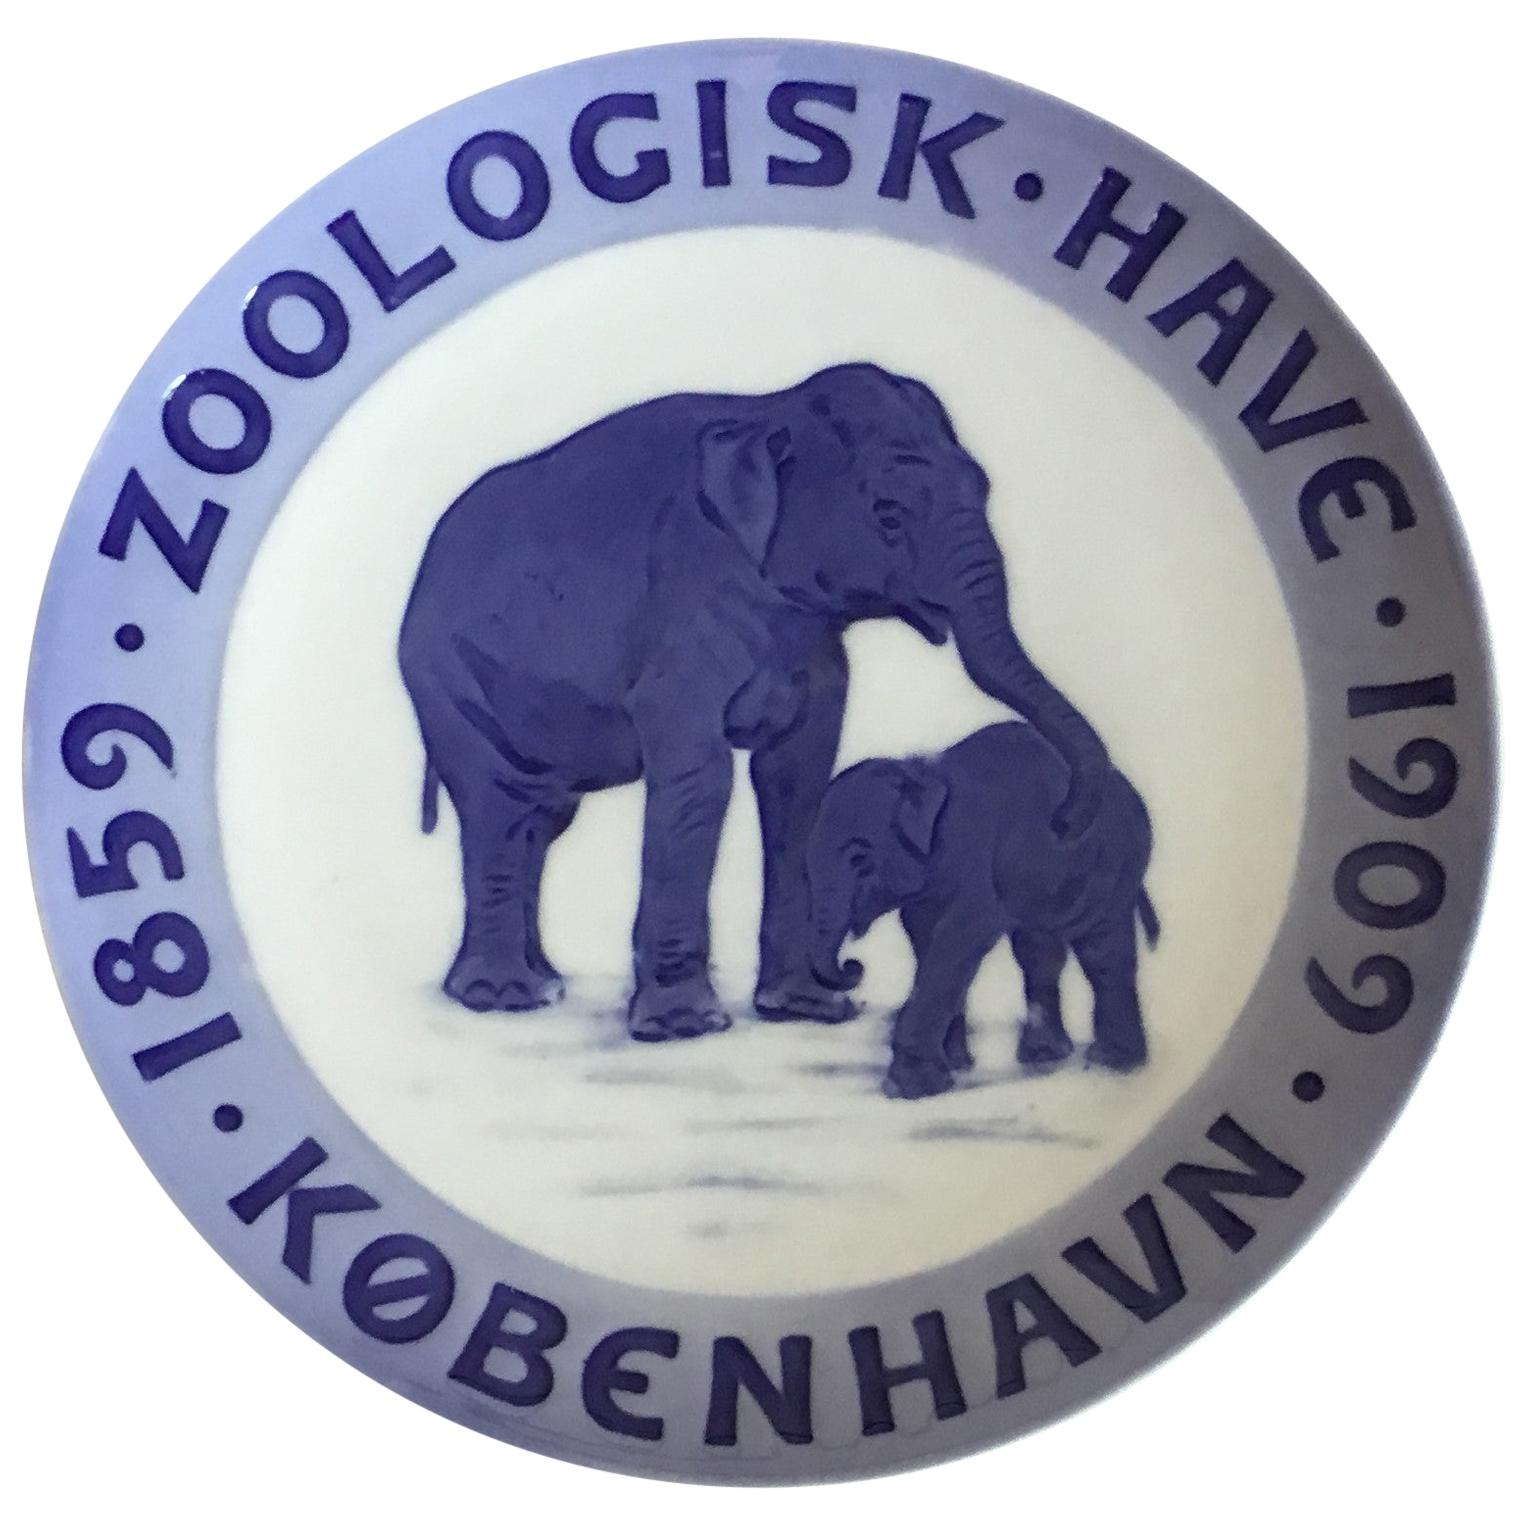 Royal Copenhagen Commemorative Plate from 1909 RC-CM92